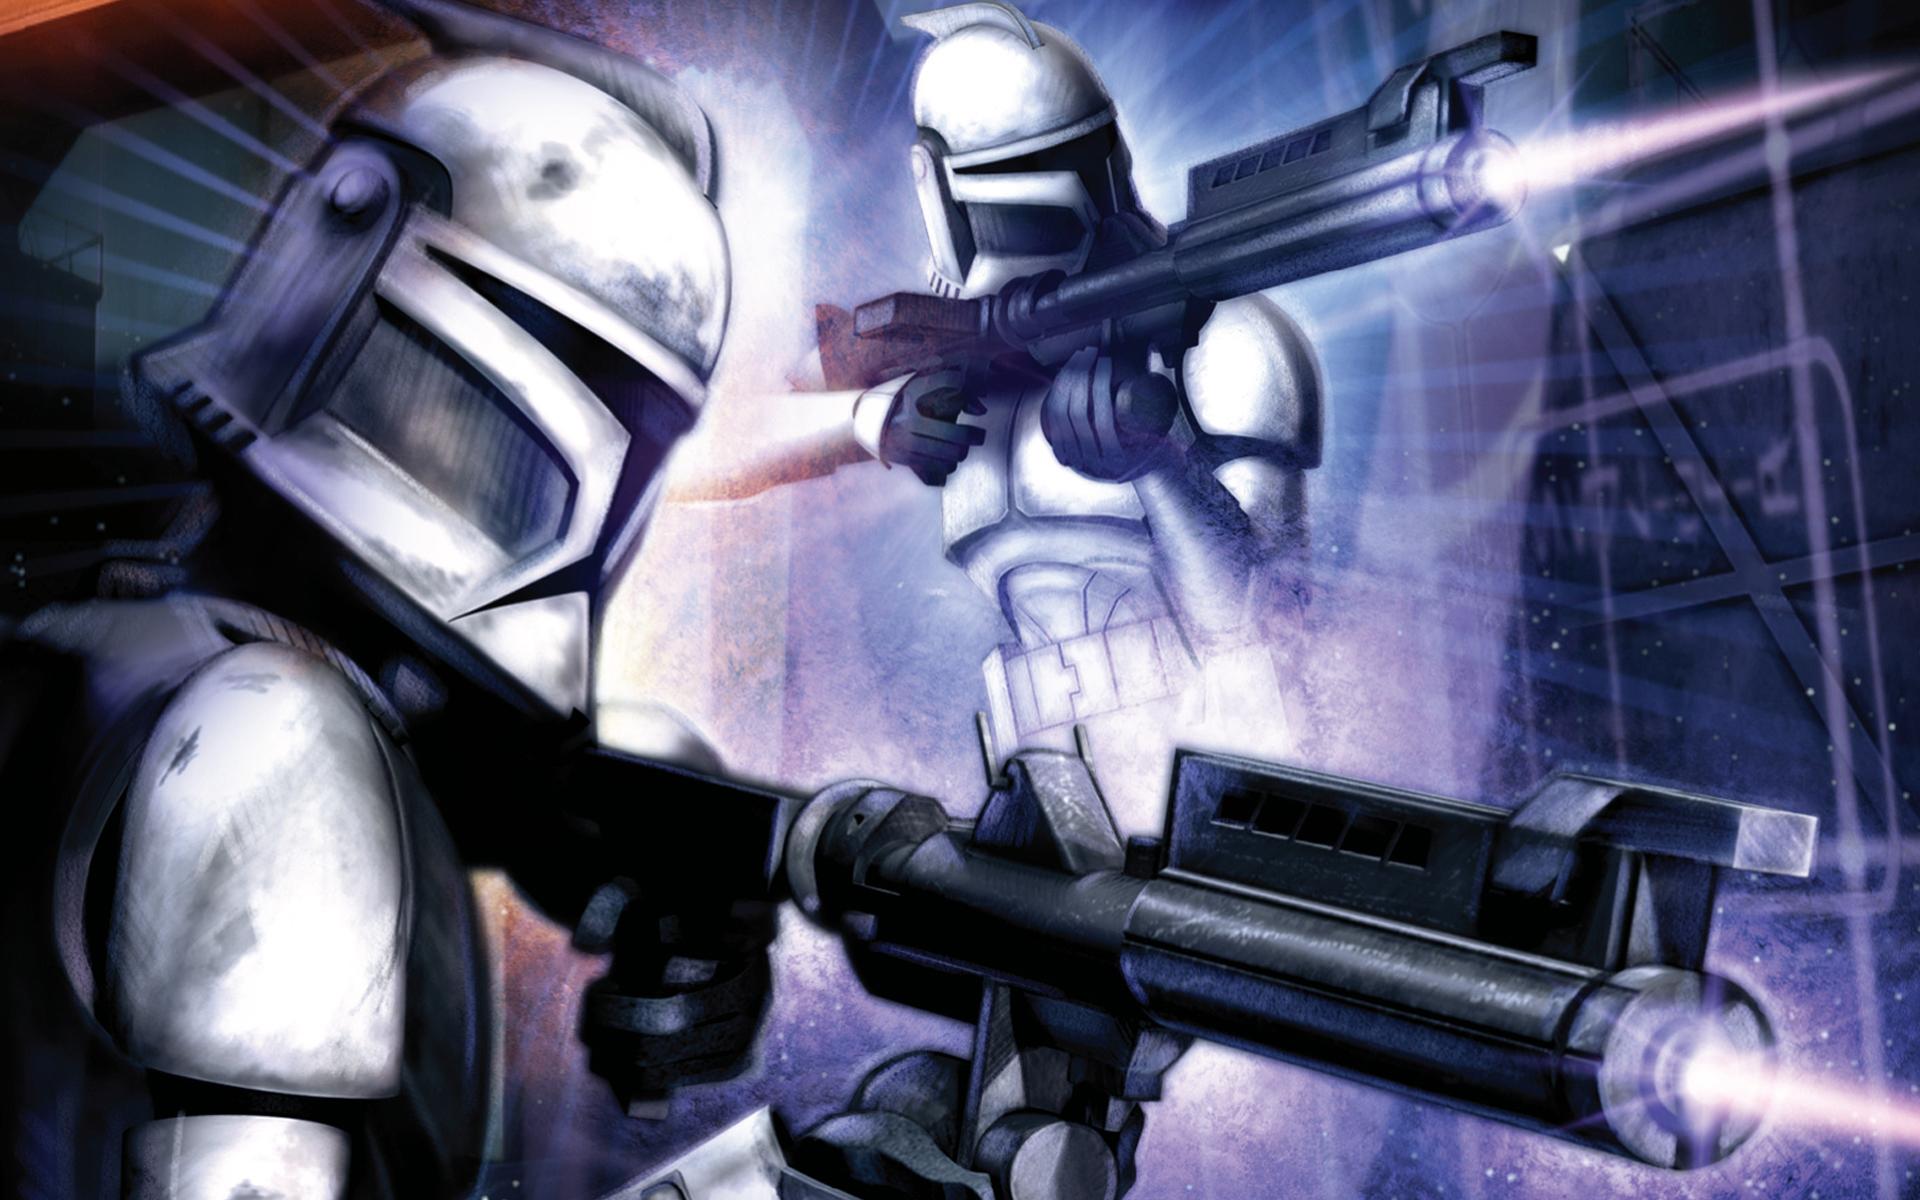 47 Star Wars 1080p Hd Wallpaper On Wallpapersafari